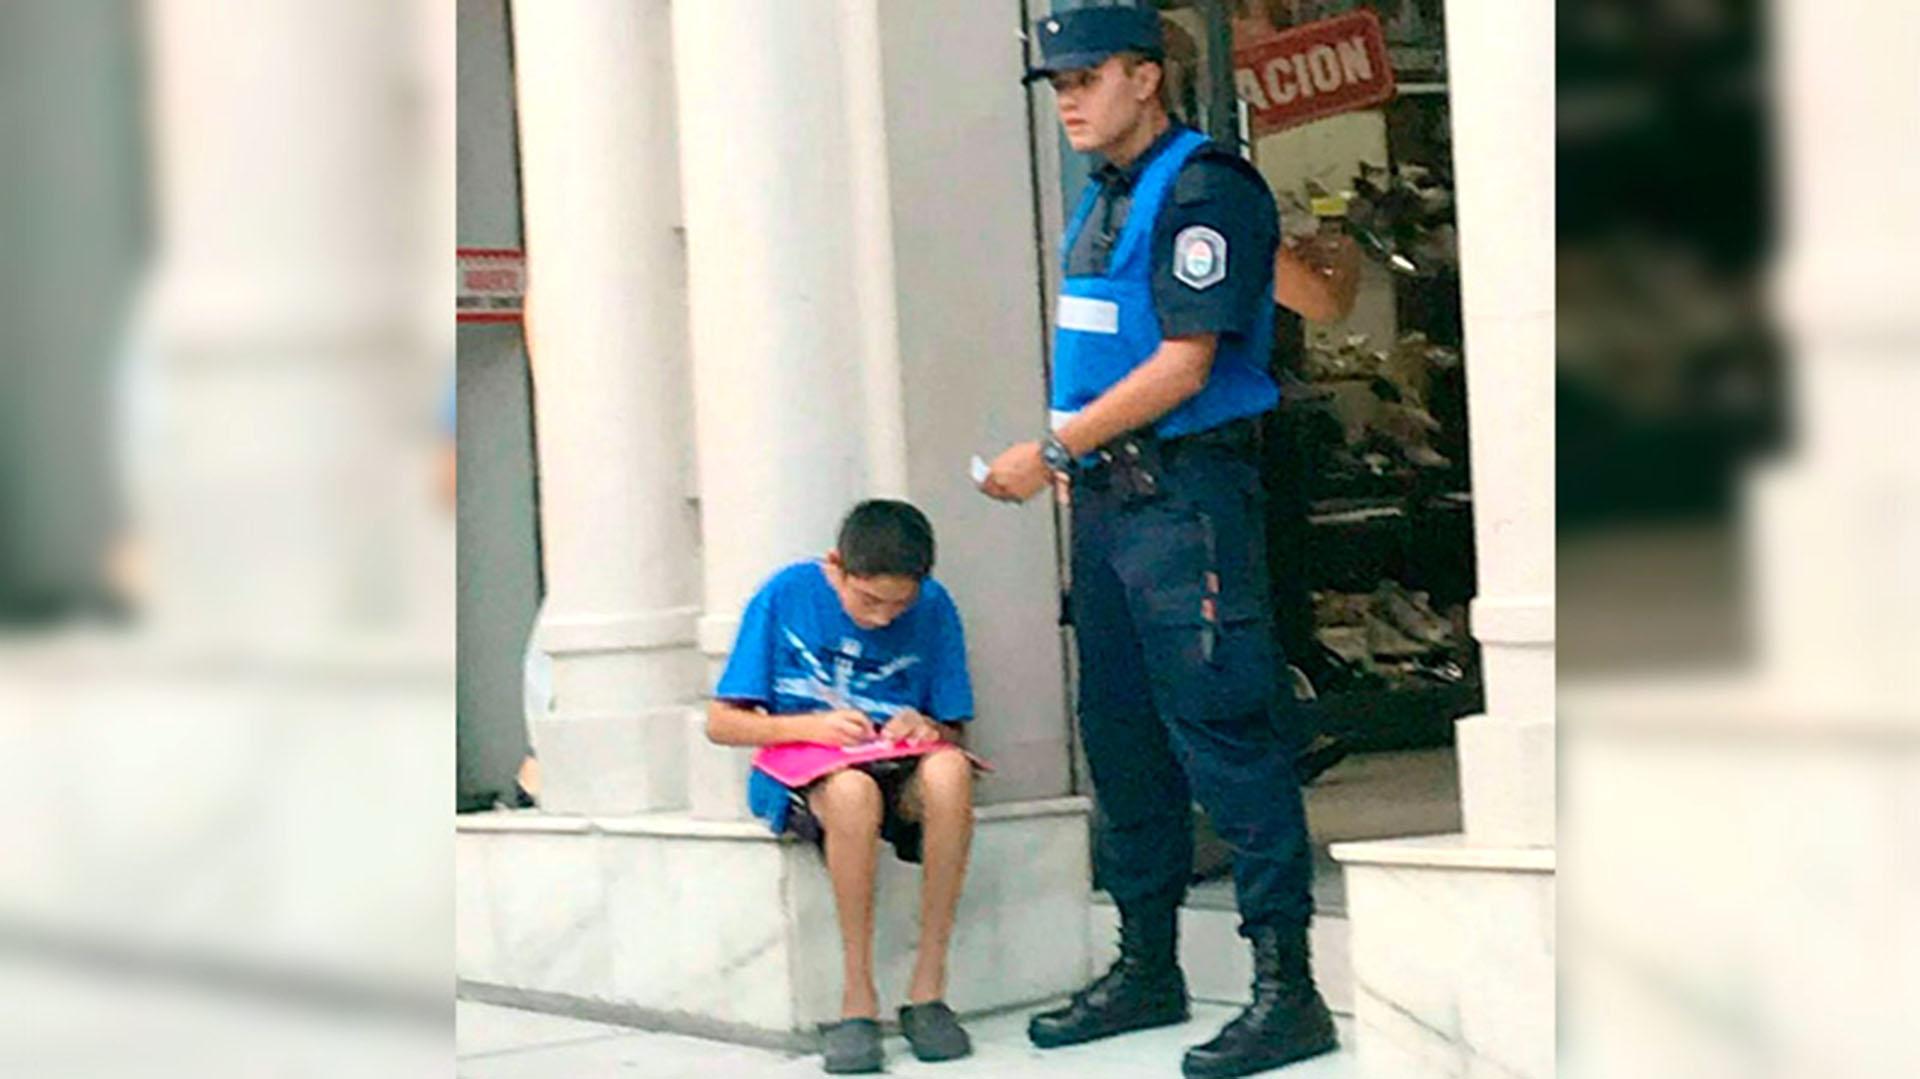 https://s3.amazonaws.com/arc-wordpress-client-uploads/infobae-wp/wp-content/uploads/2018/03/13122033/Cristian-Irigoitia-policia-ayuda-tarea-1920-2.jpg